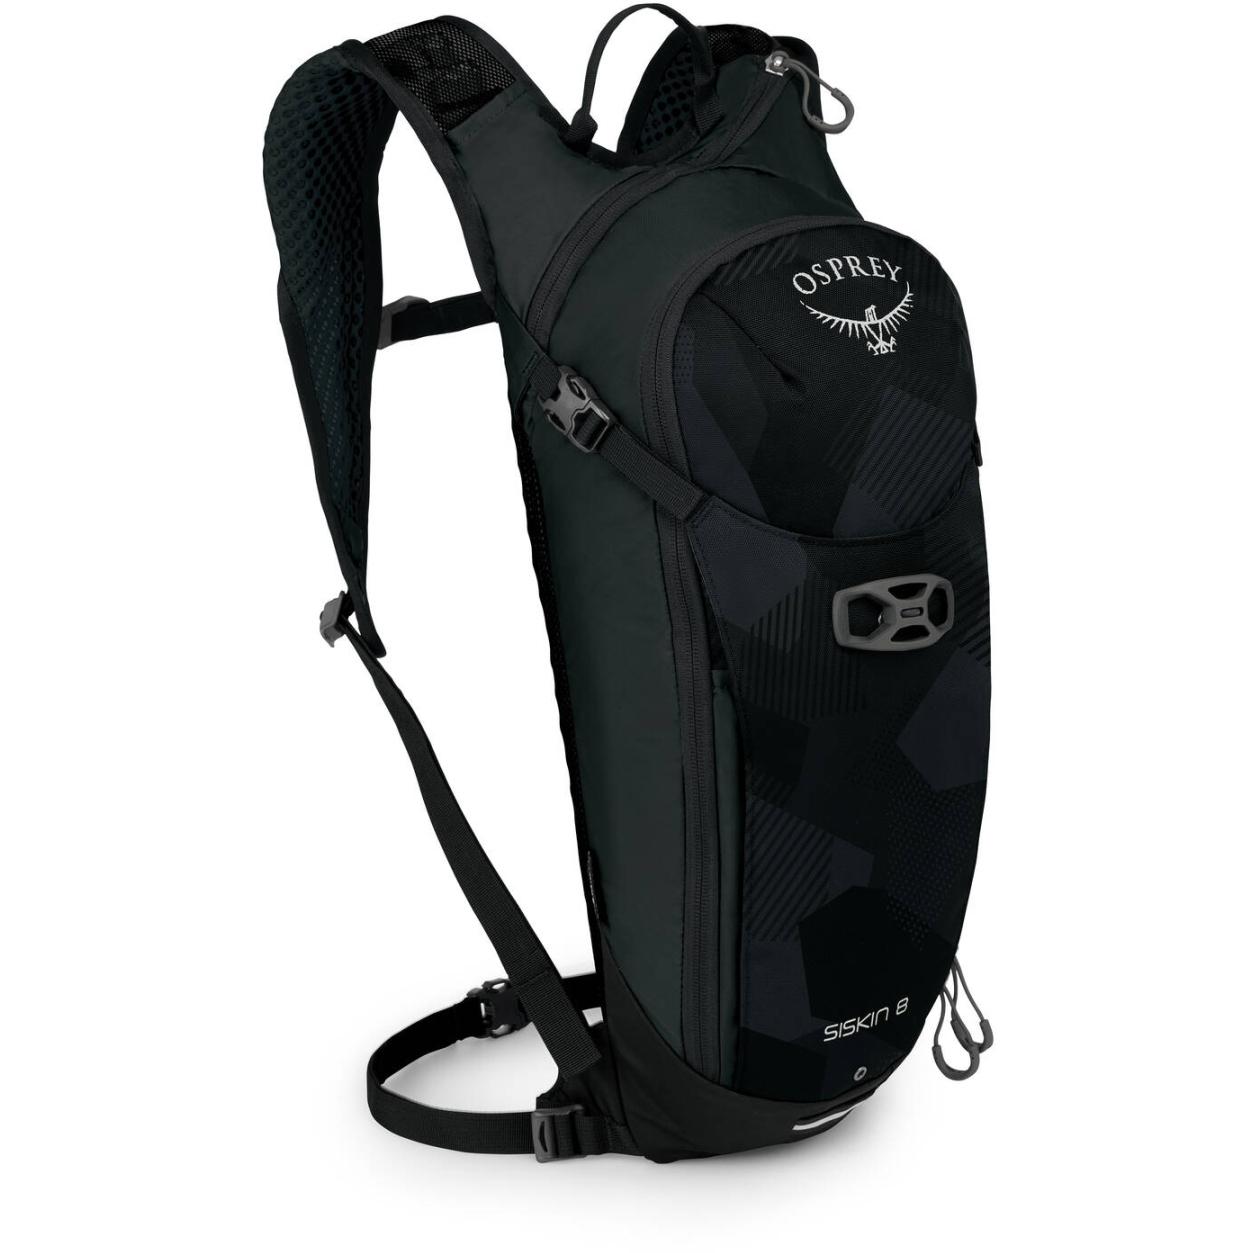 Osprey Siskin 8 Hydration Backpack - Obsidian Black